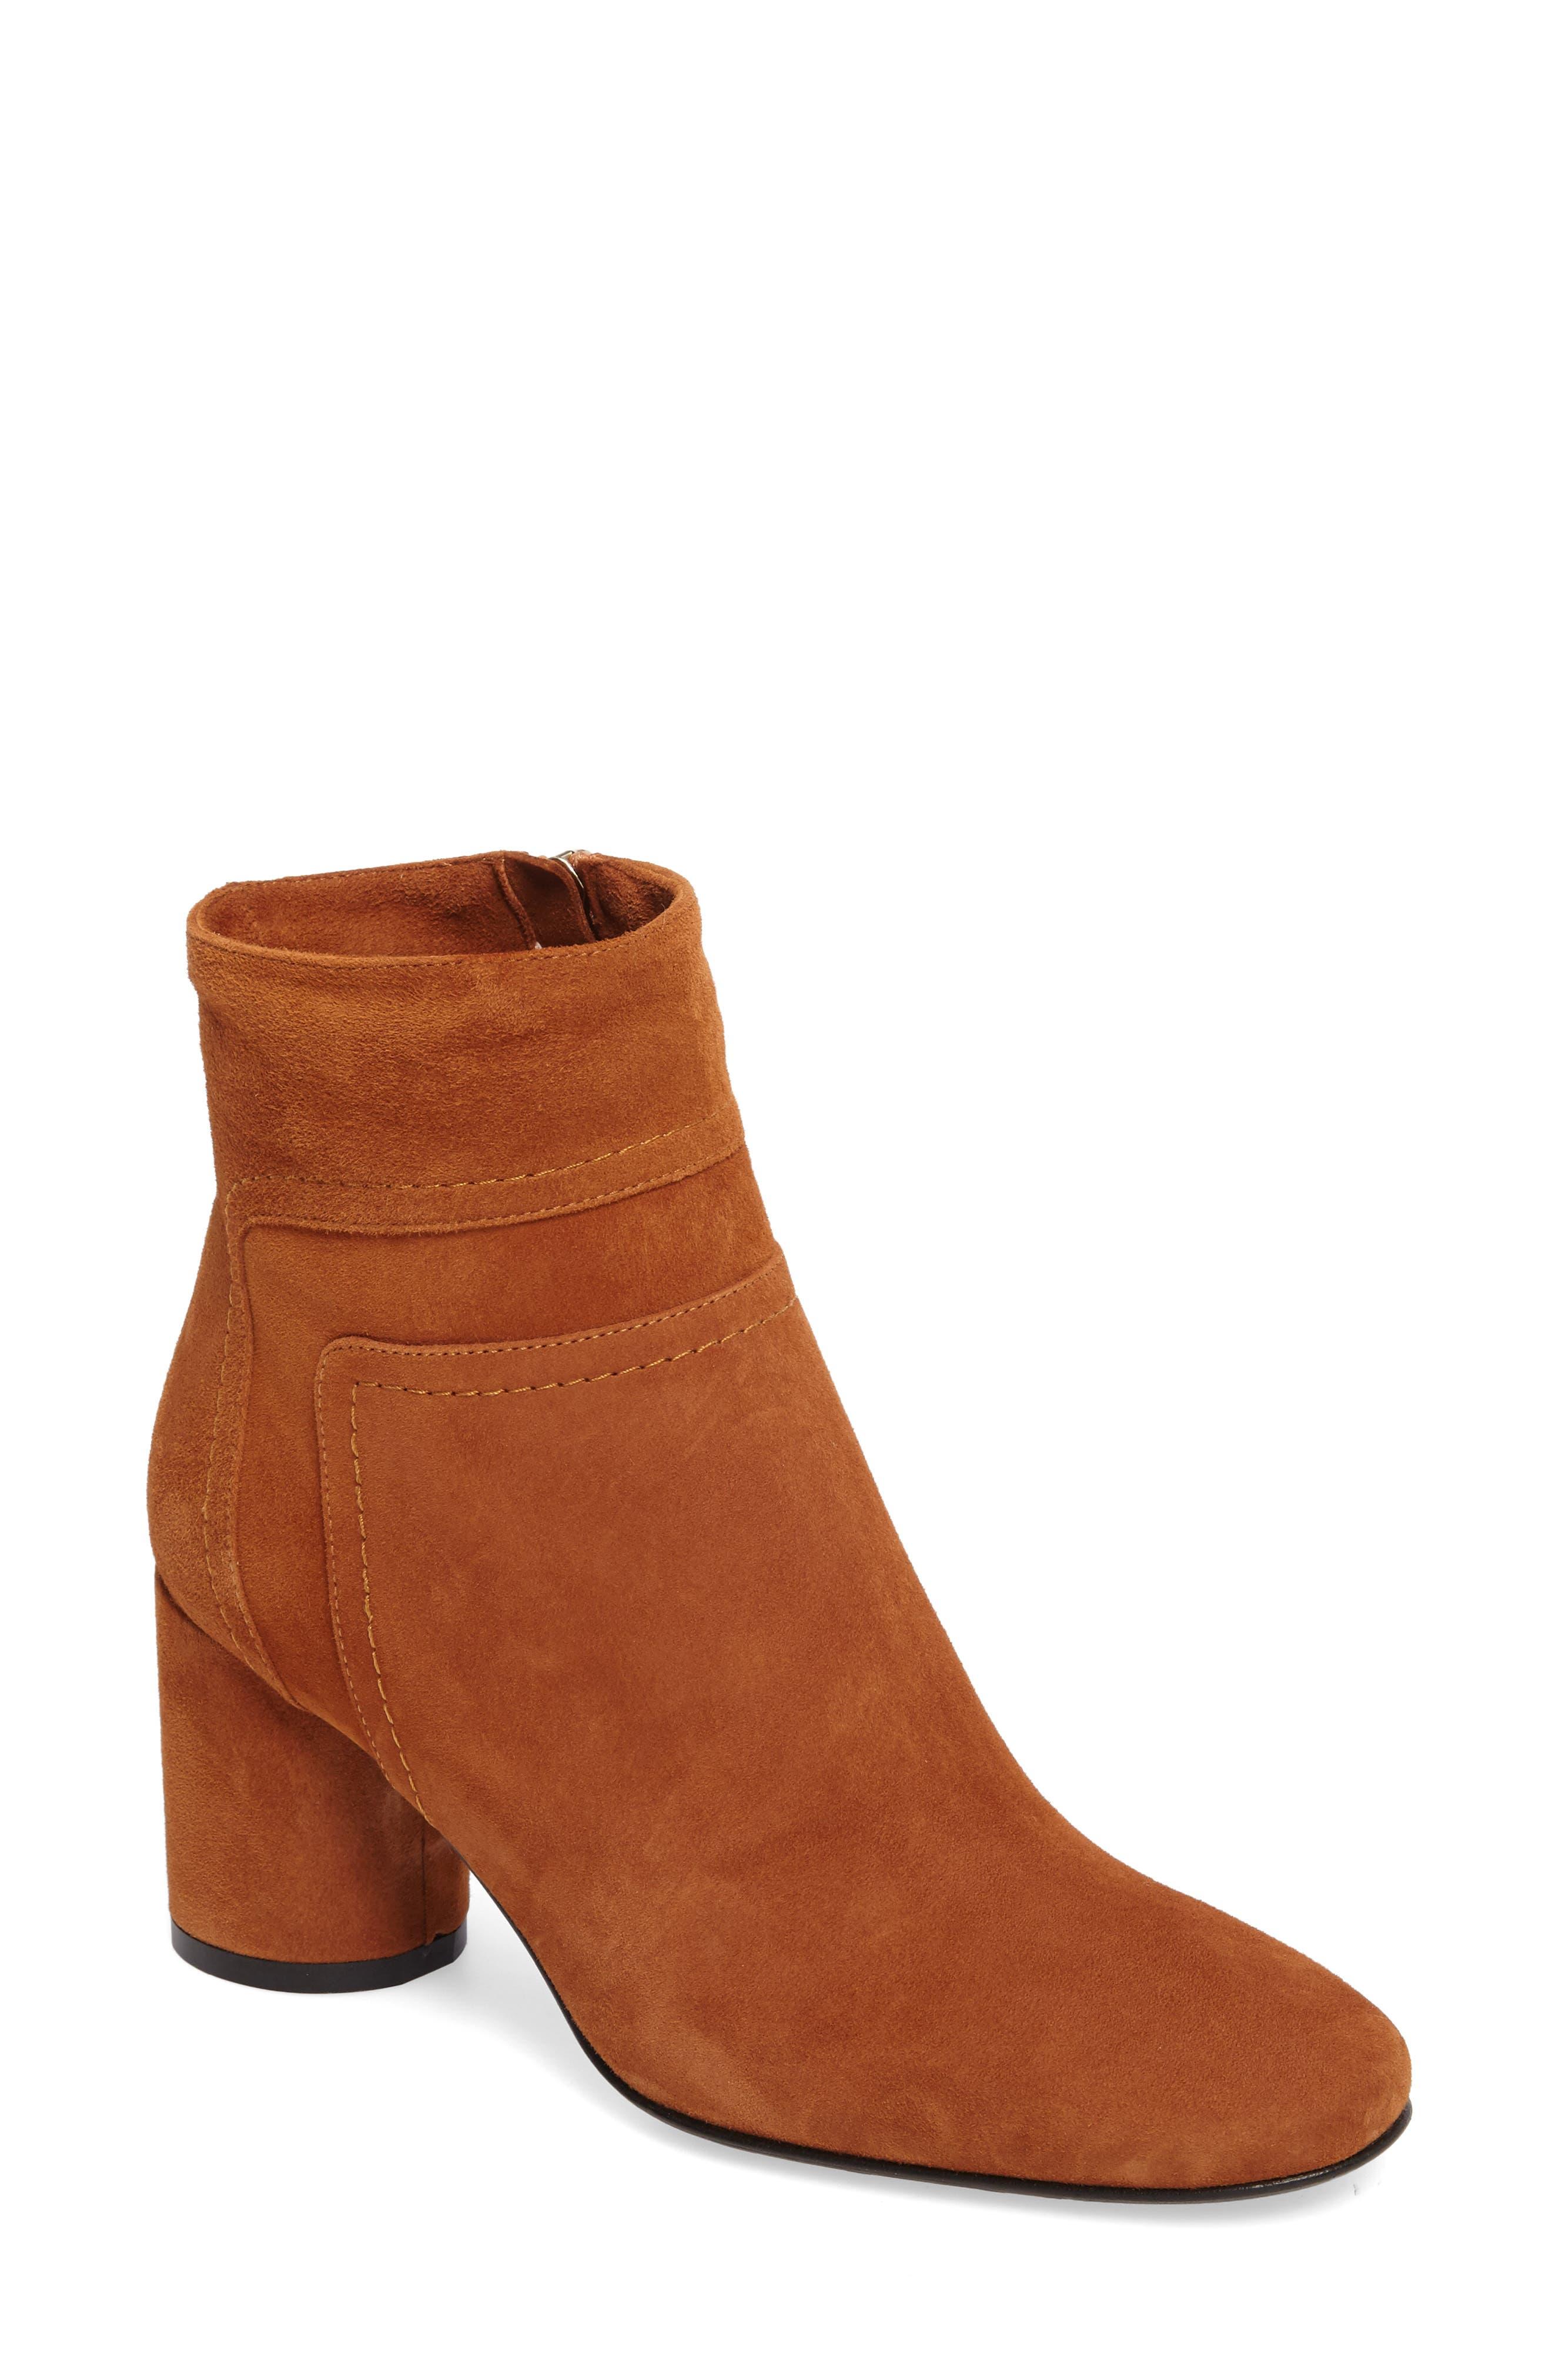 Fortuna Block Heel Bootie,                         Main,                         color, Tan Suede